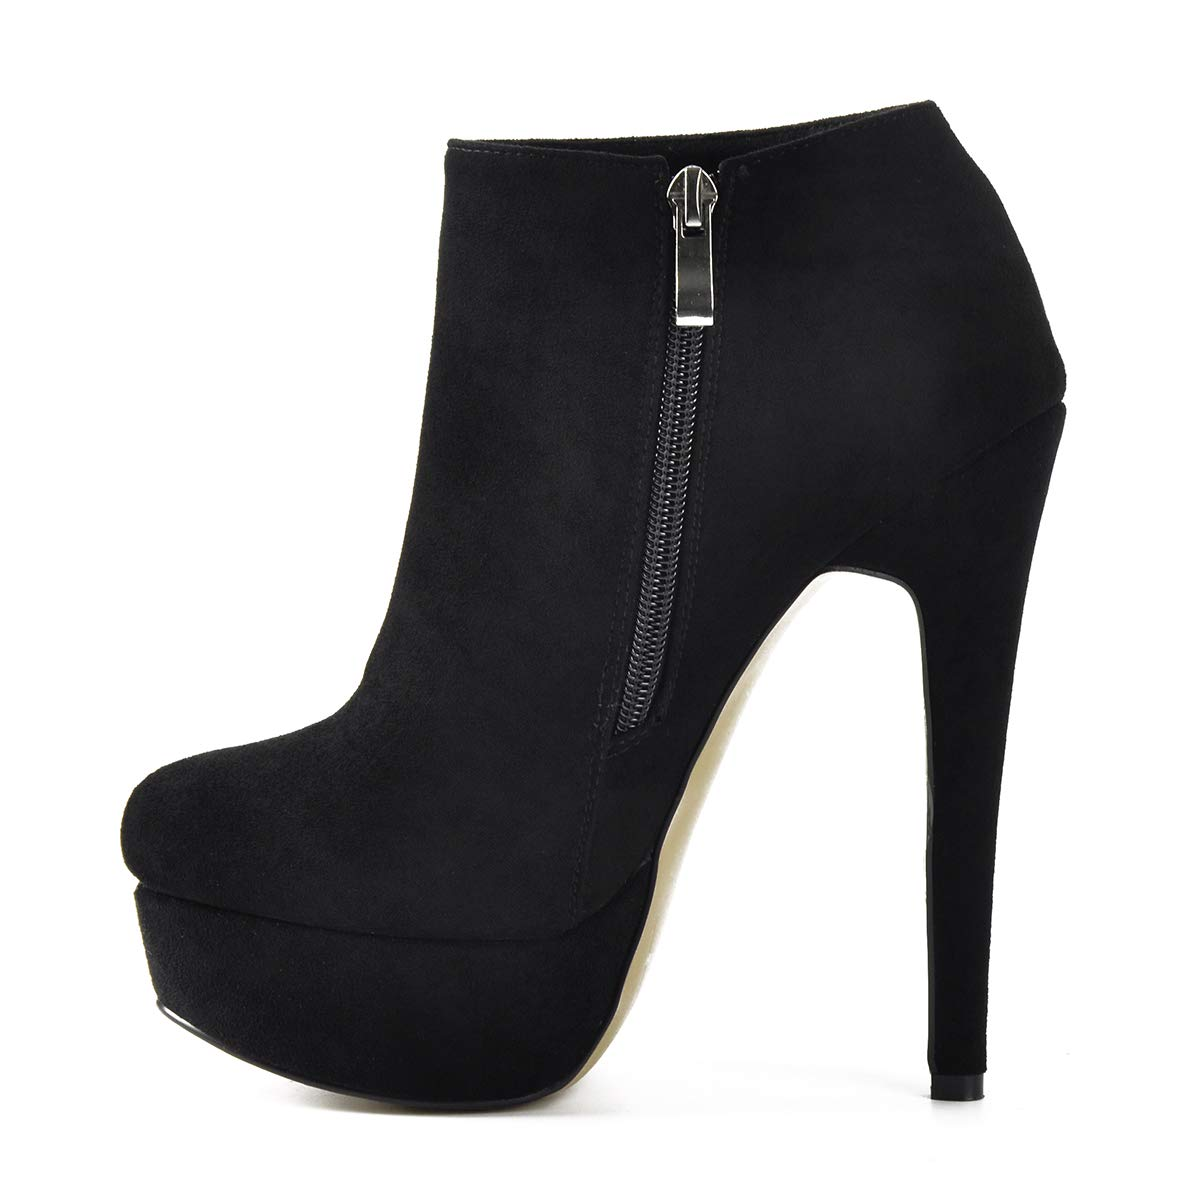 ff08d7c95 Amazon.com | Onlymaker Woman Stiletto Platform Zipper Ankle Boots Pointed  Toe Sexy Lady Short Bootie | Ankle & Bootie